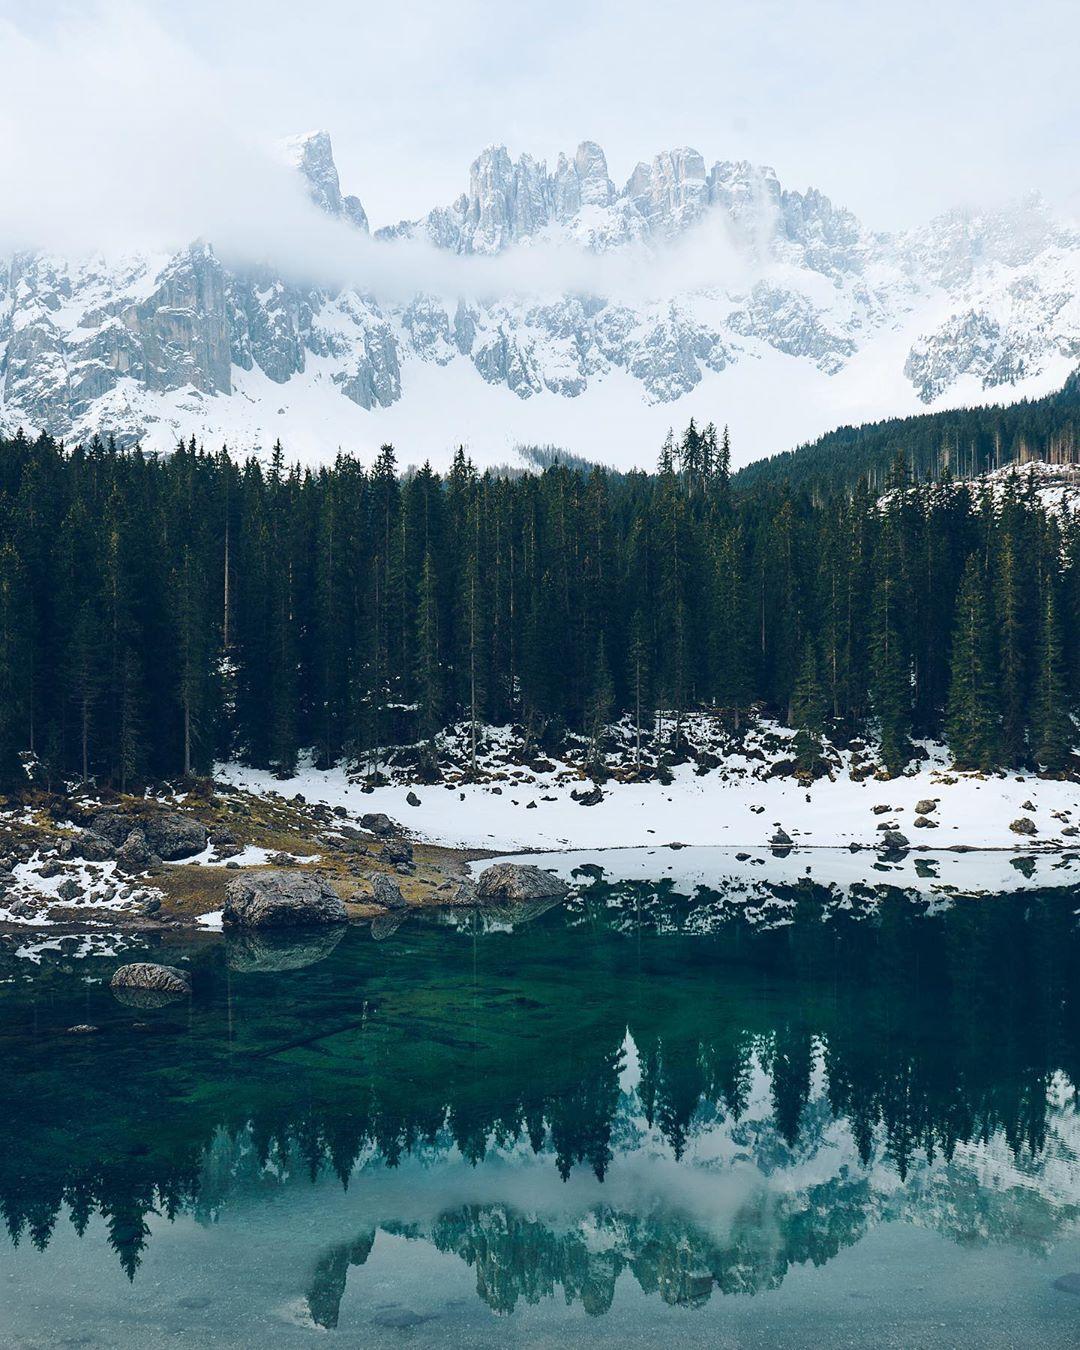 Пейзажи и путешествия на снимках Даниэля Шумахера